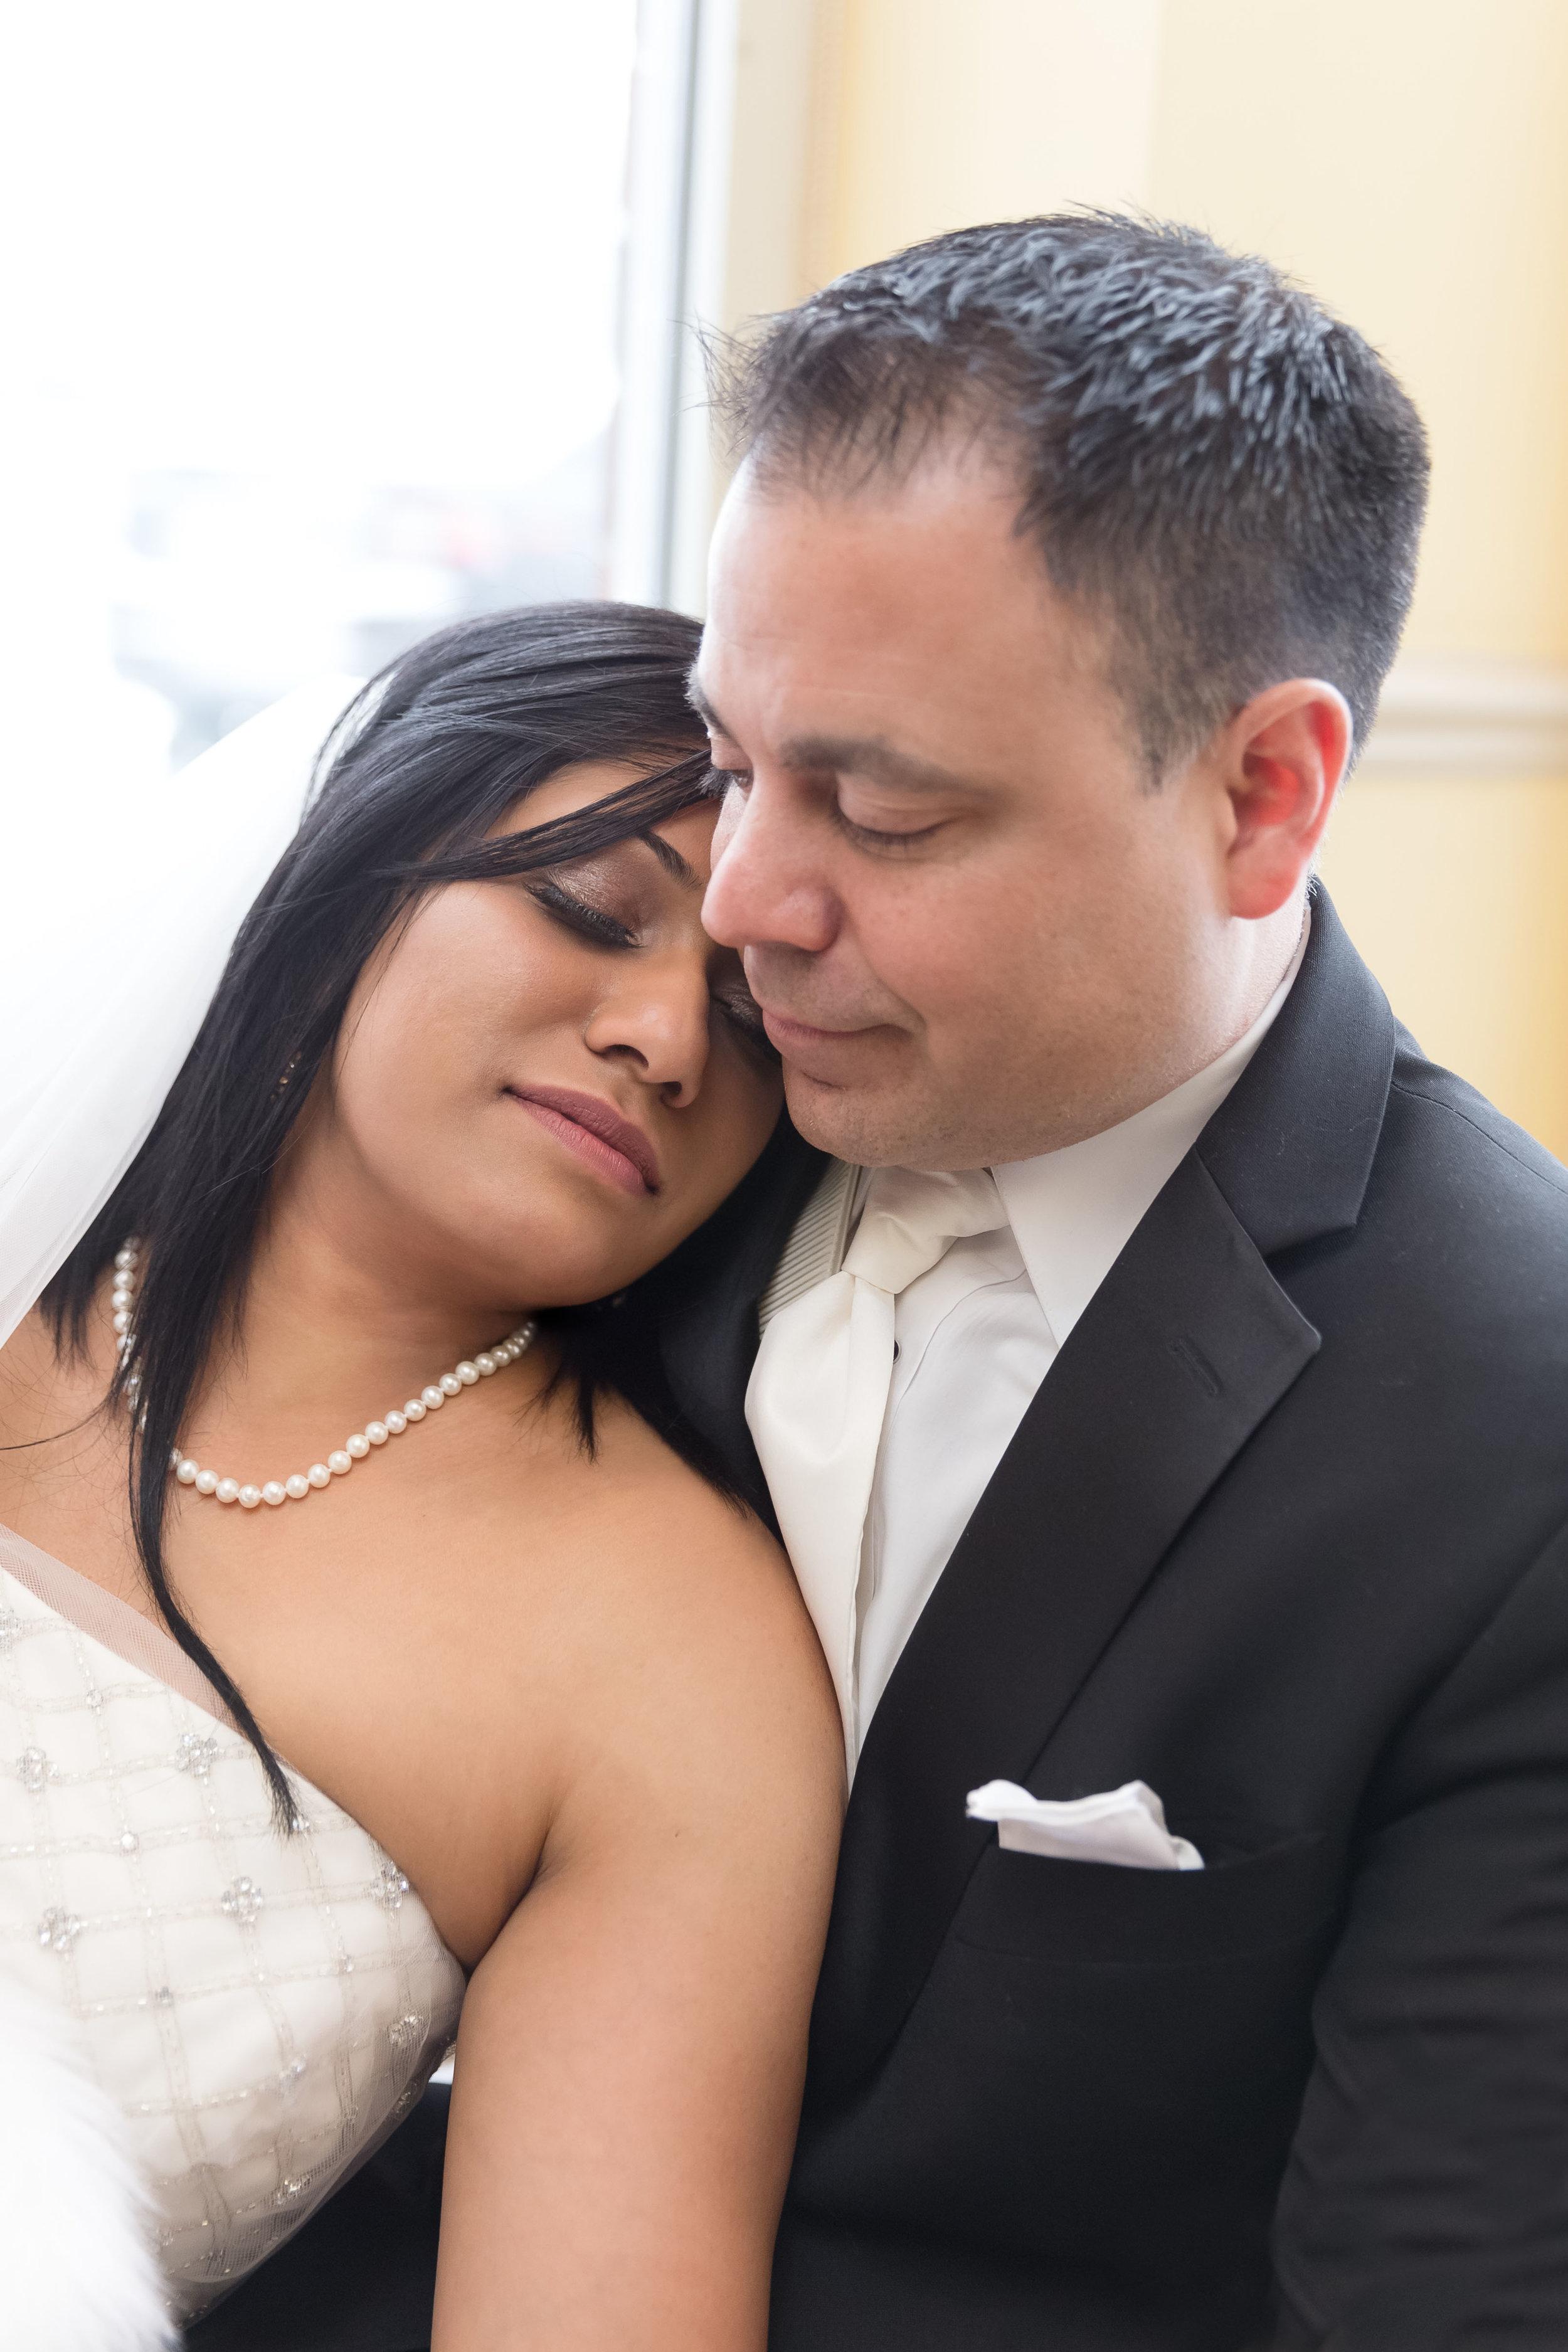 JVaughn_Photography_Weddings_Huntley_Photographer_Professional_Wedding0339.jpg